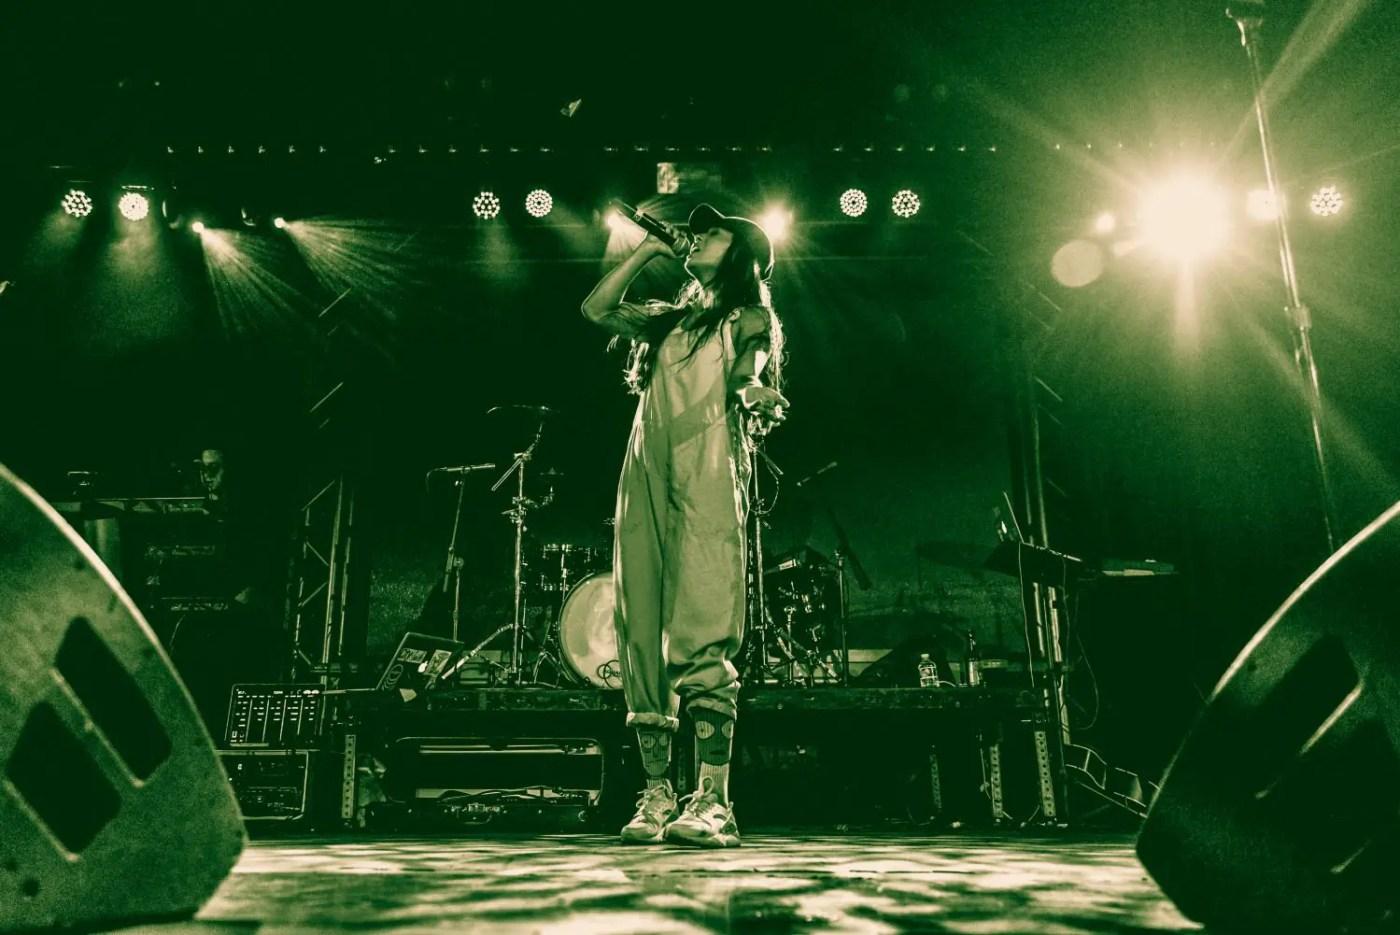 Leilani Wolfgramm : Vinyl | Photos | LIVING LIFE FEARLESS